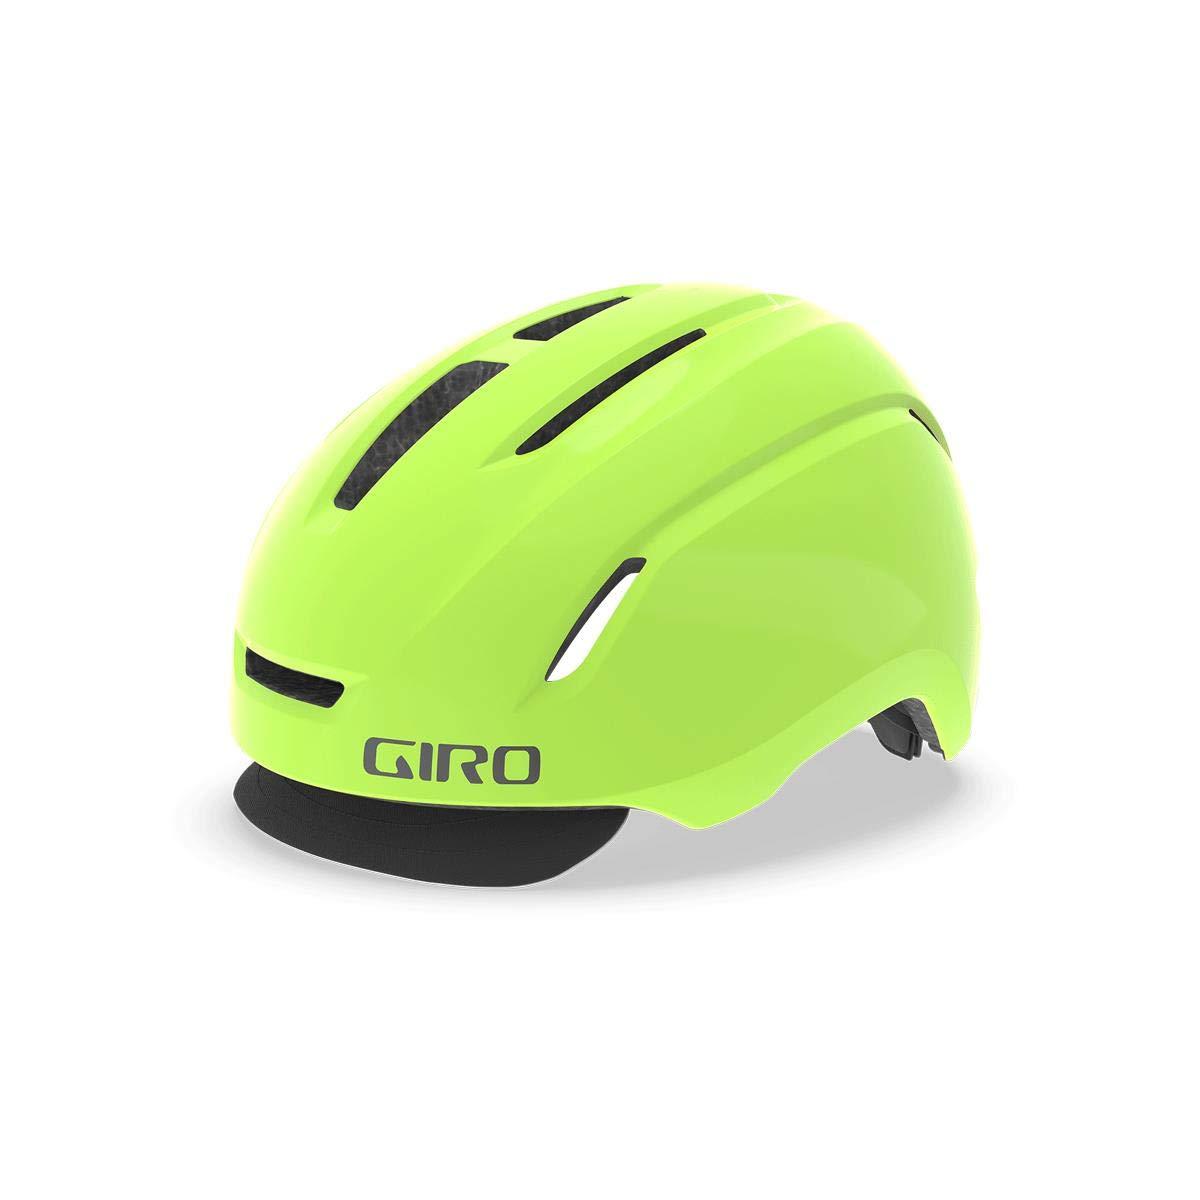 Giro Caden LED City Fahrrad Helm gelb 2019